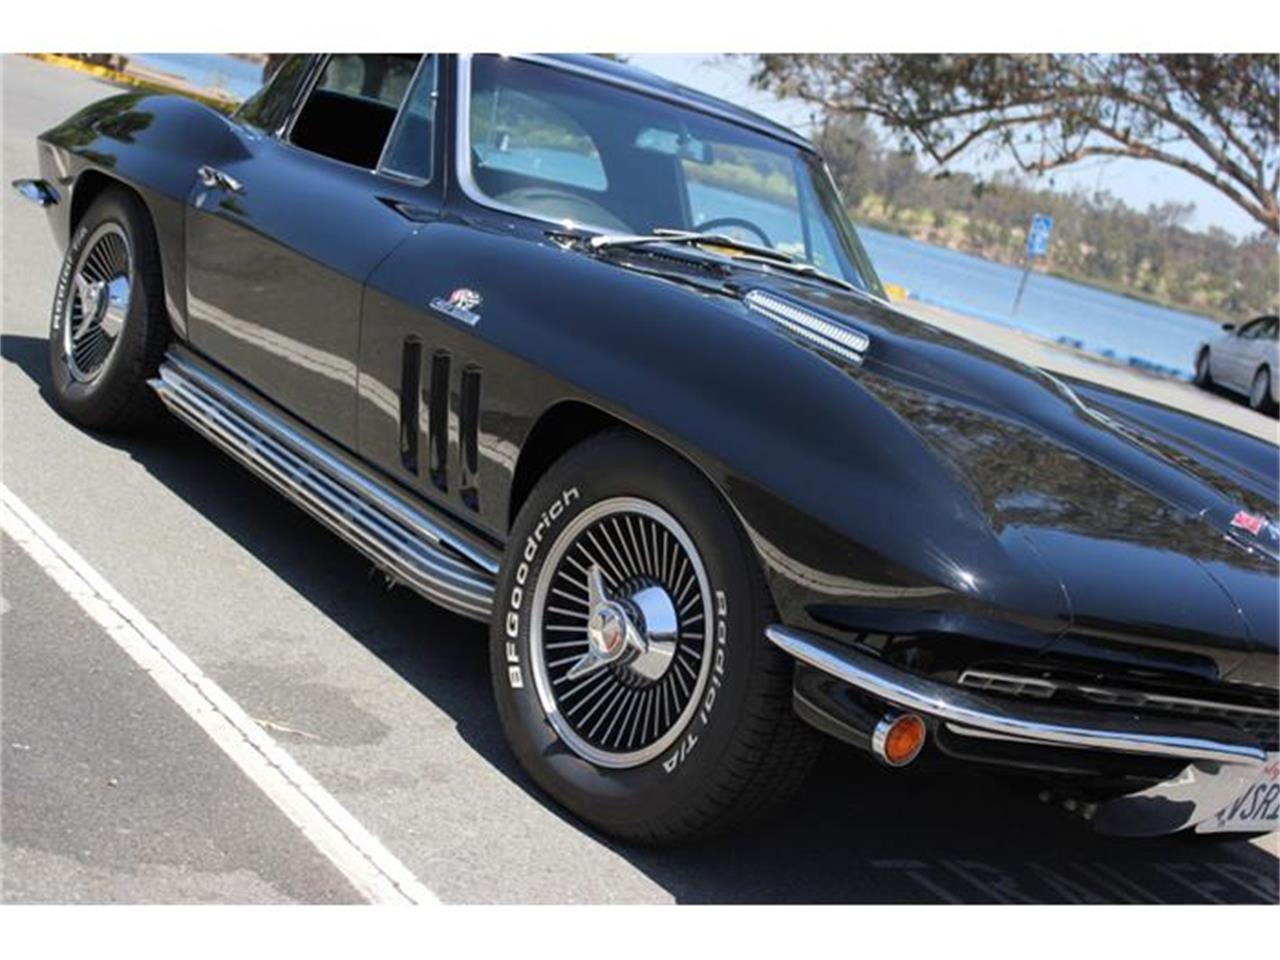 Large Picture of '66 Corvette located in California - $110,000.00 - EU77